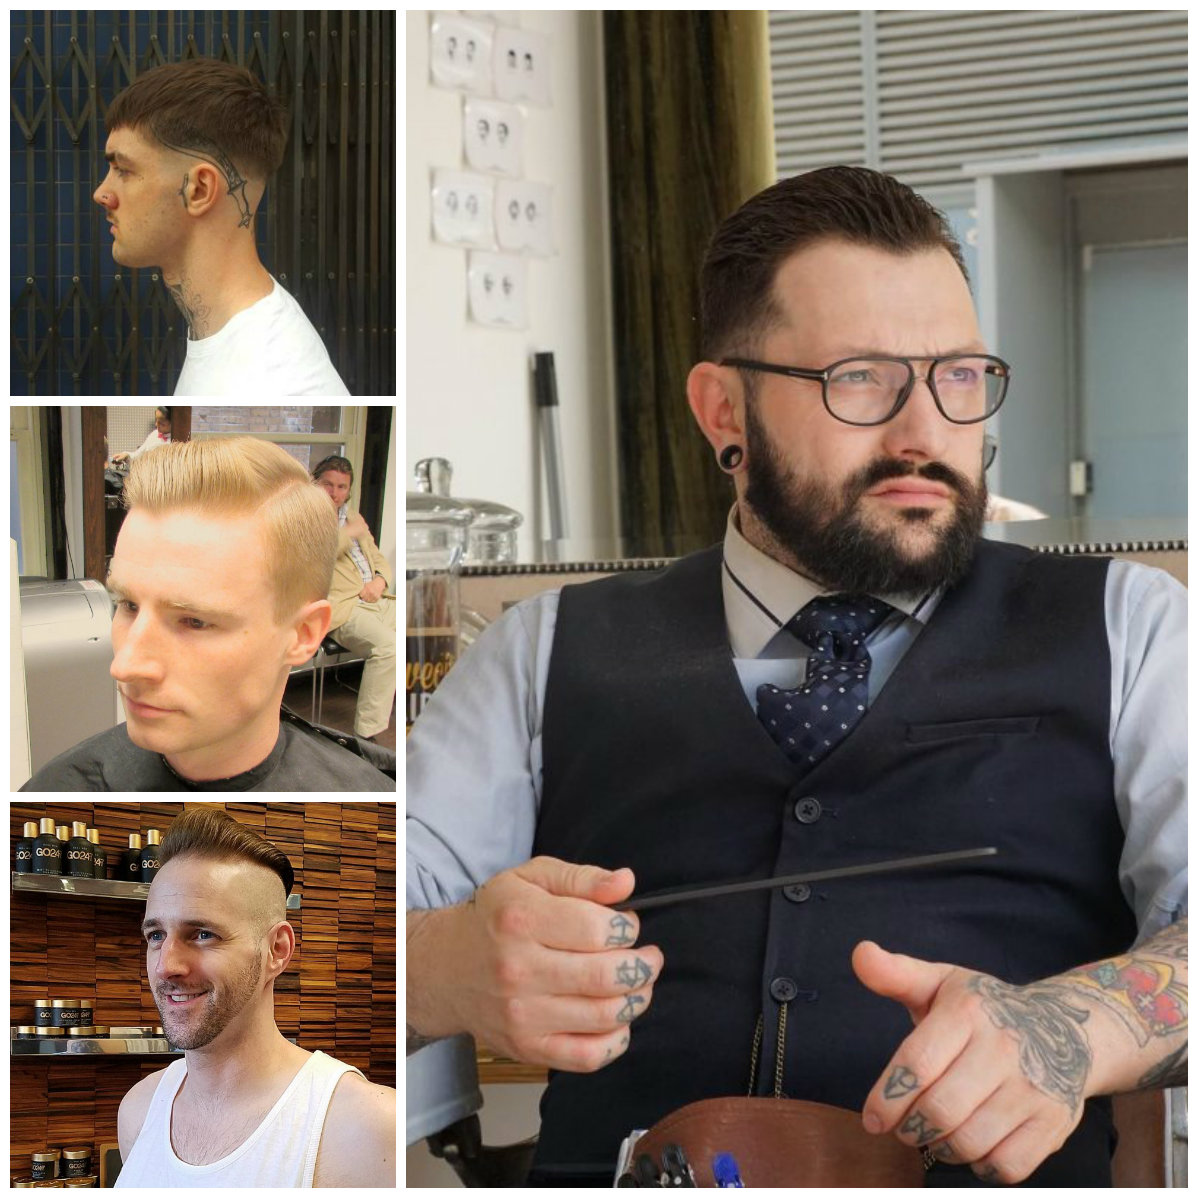 Cool Nazi Haircuts for Men